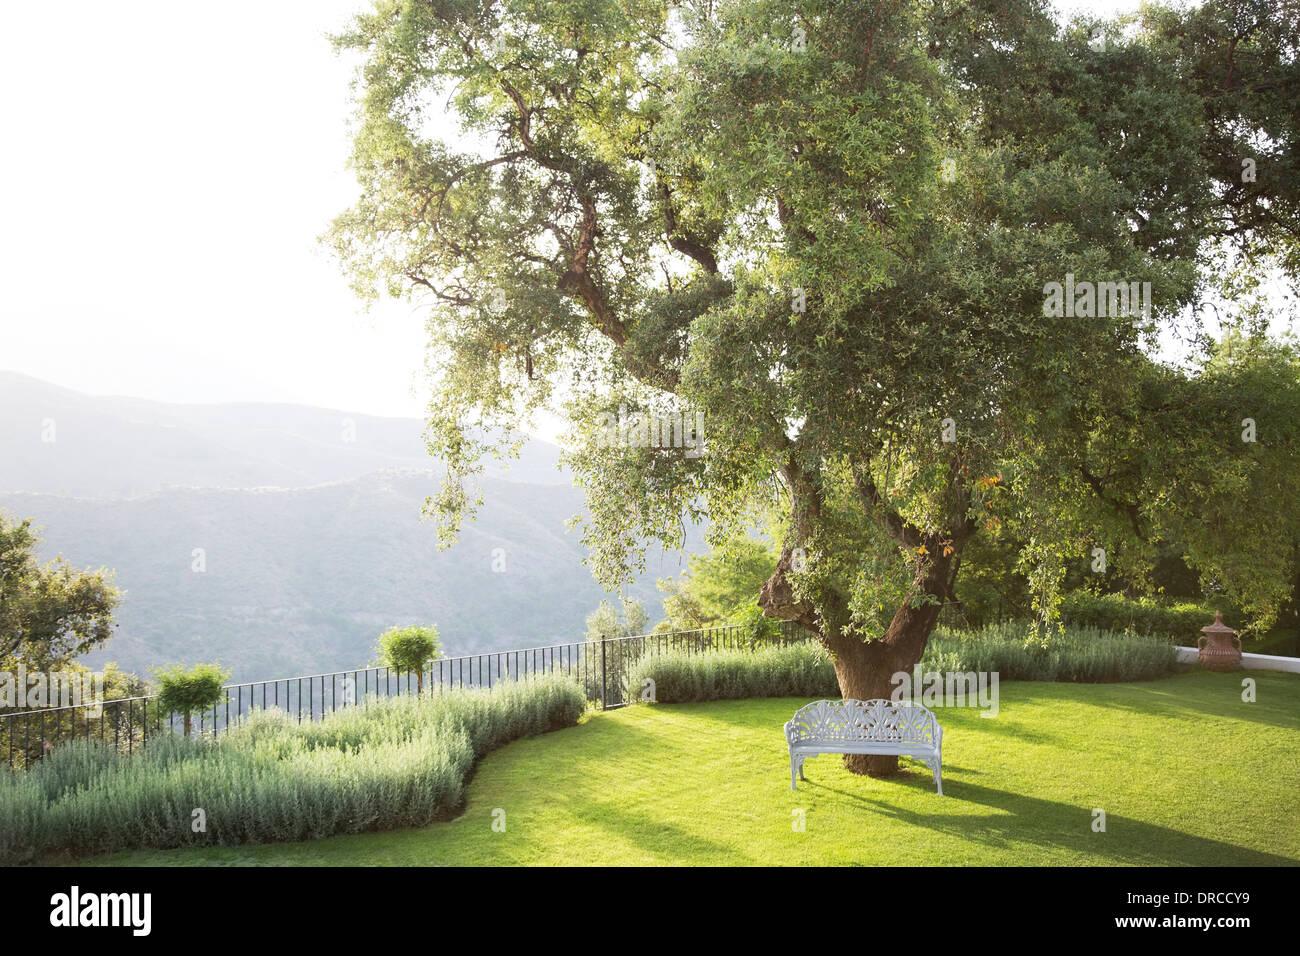 En vertu de l'arbre en banc parc calme Photo Stock